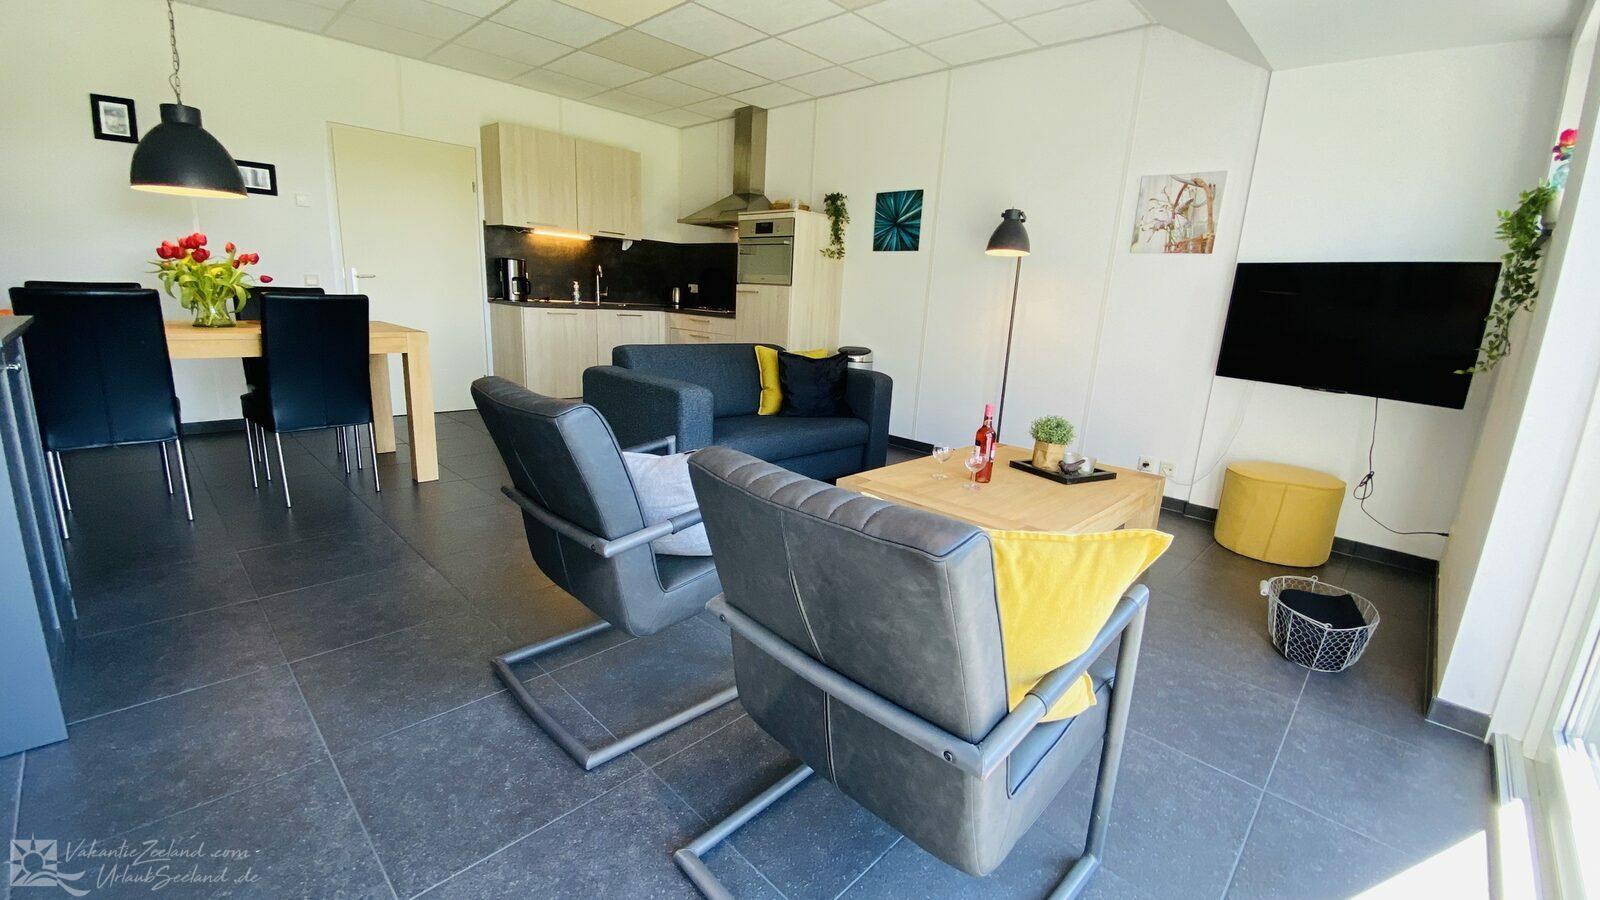 VZ179-Ferienunterkunft in Zoutelande